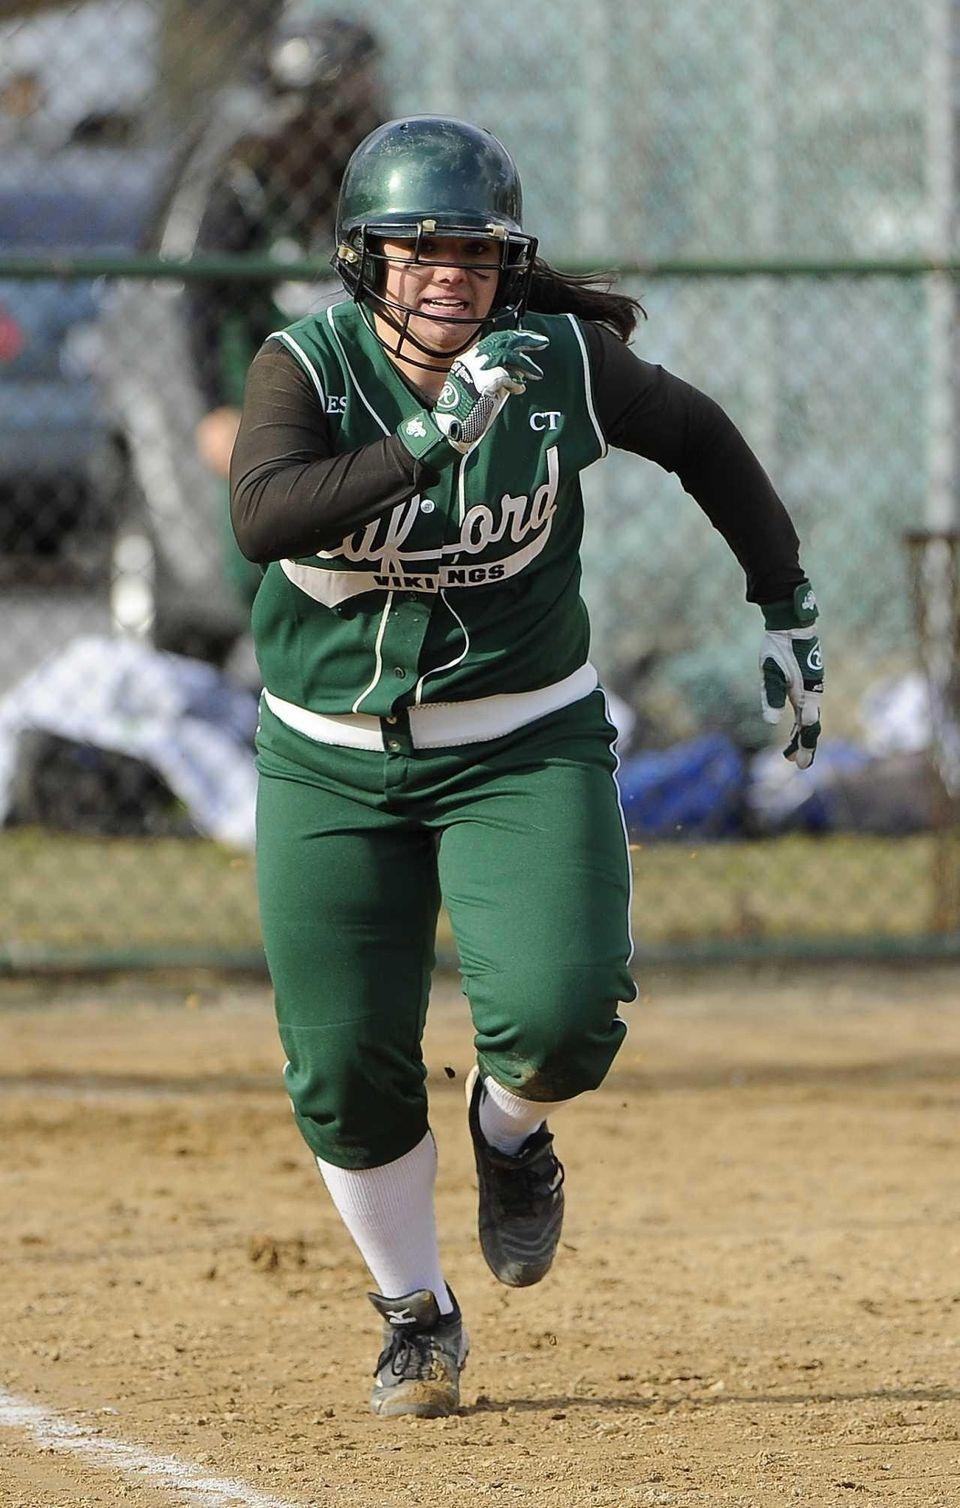 Seaford's Lindsay Montemarano runs the bases after hitting